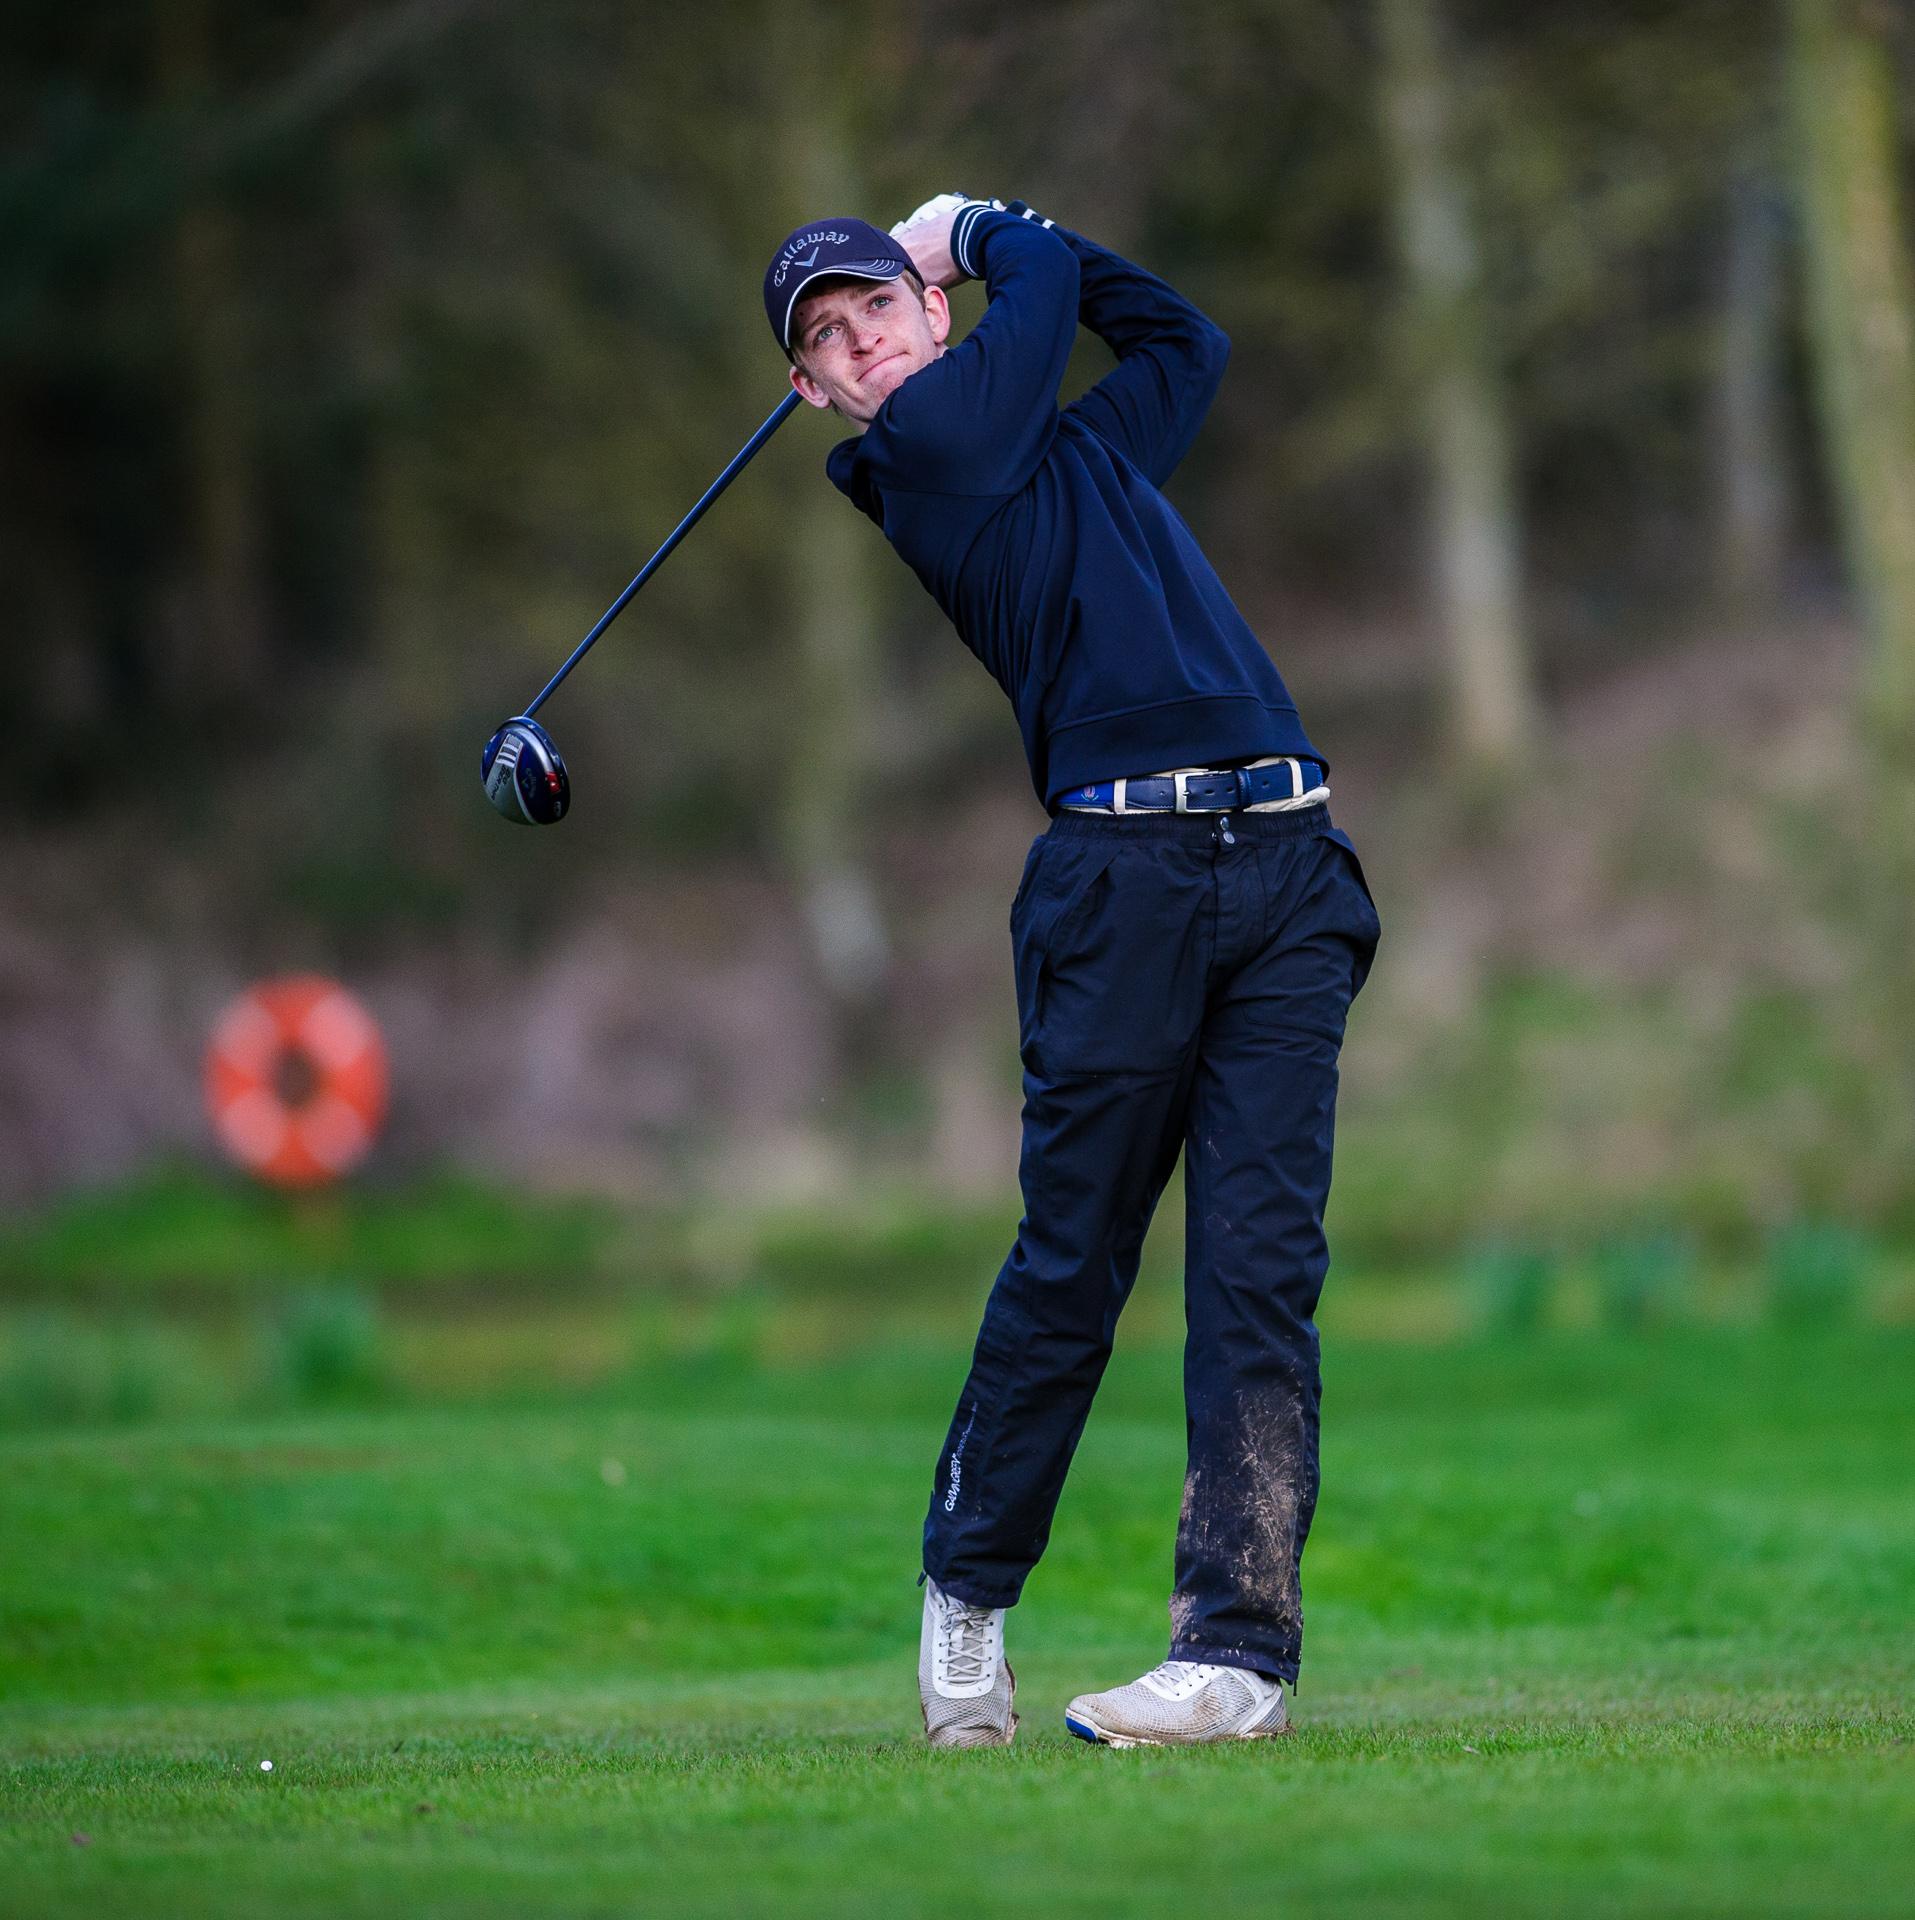 Kevindiss.com golf course photography Hawkstone Park golf course-2-60.jpg